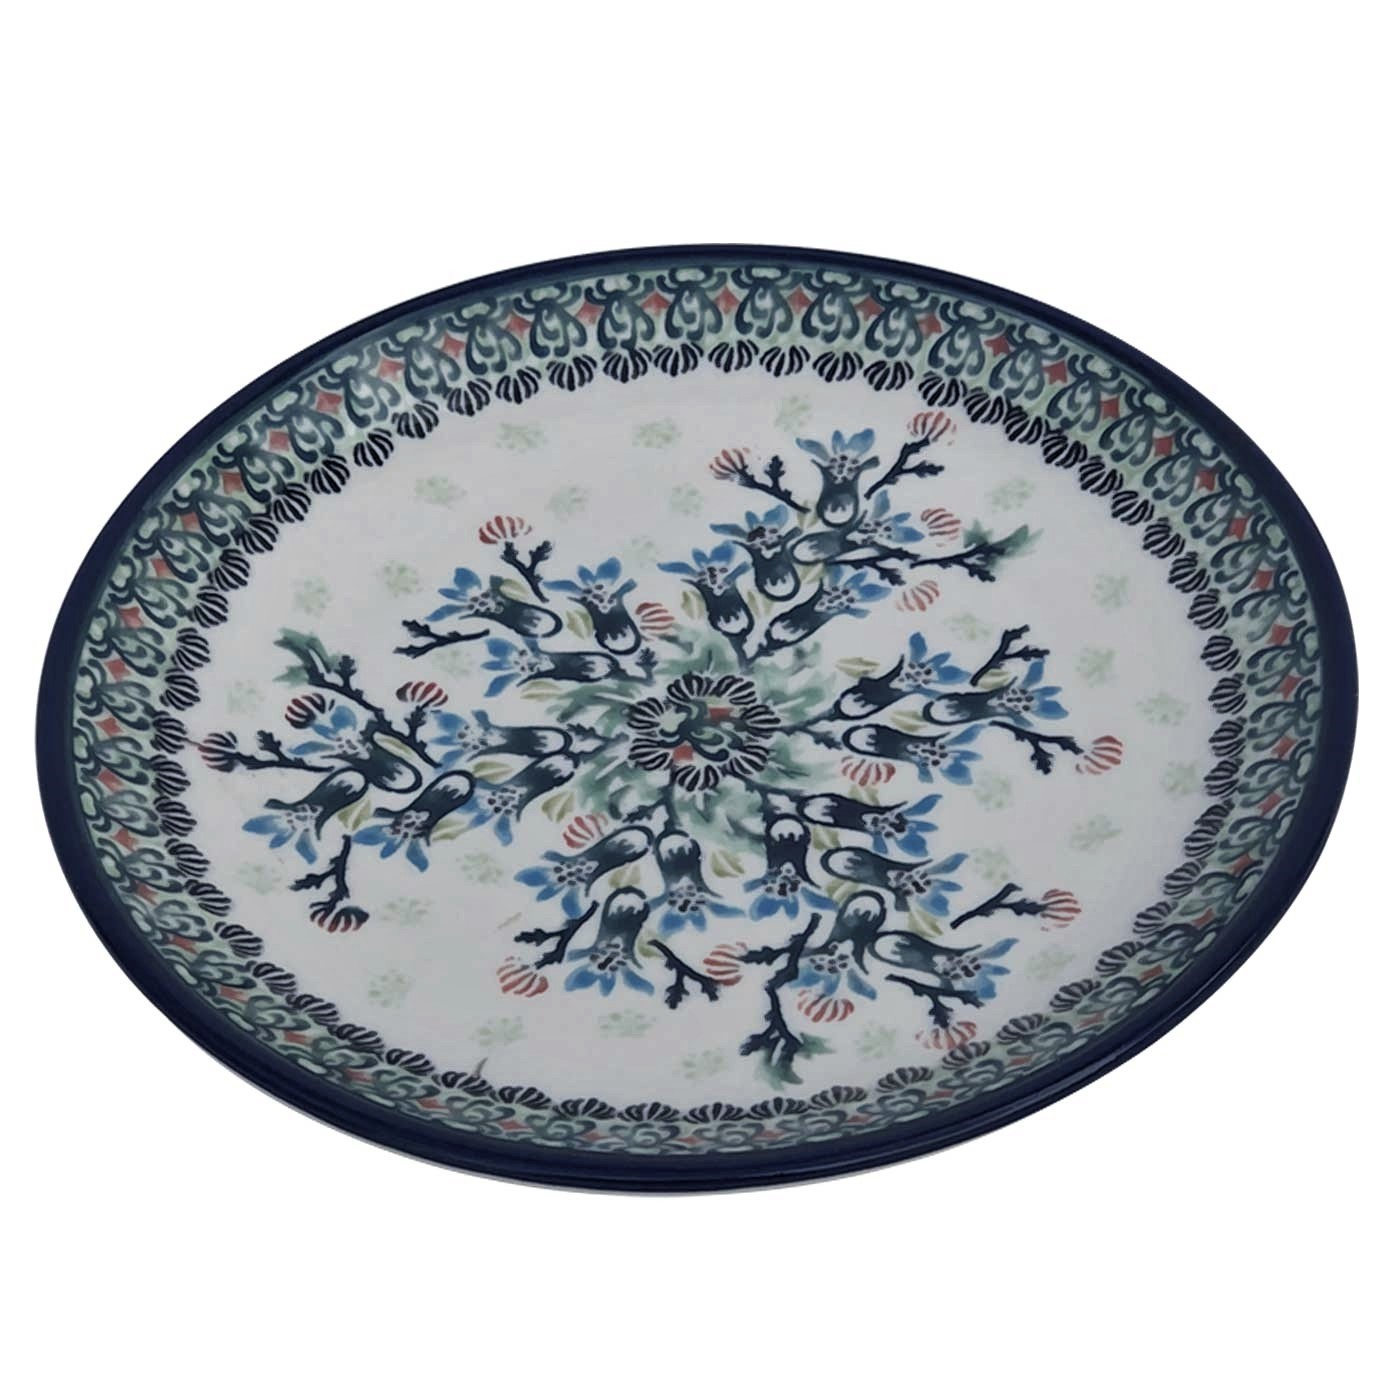 Pottery Avenue Stoneware Salad-Luncheon Plate - 814-DU146 Sea Garden